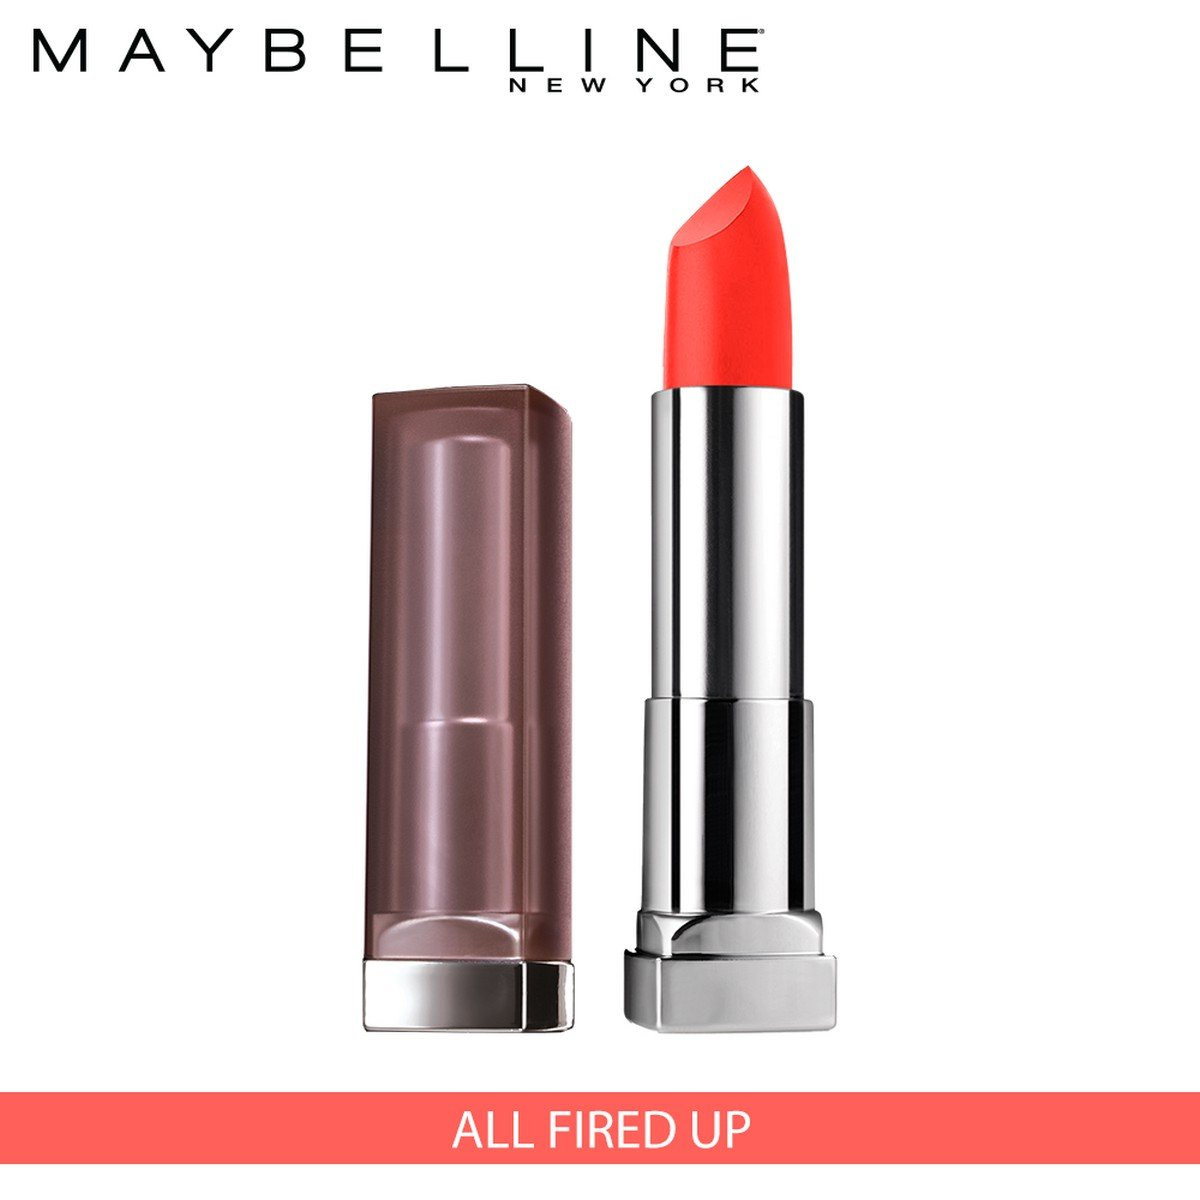 269b5c9fdc3 Amazon.com : Maybelline New York Color Sensational Creamy Matte Lipstick,  All Fired Up, 0.15 oz. : Beauty